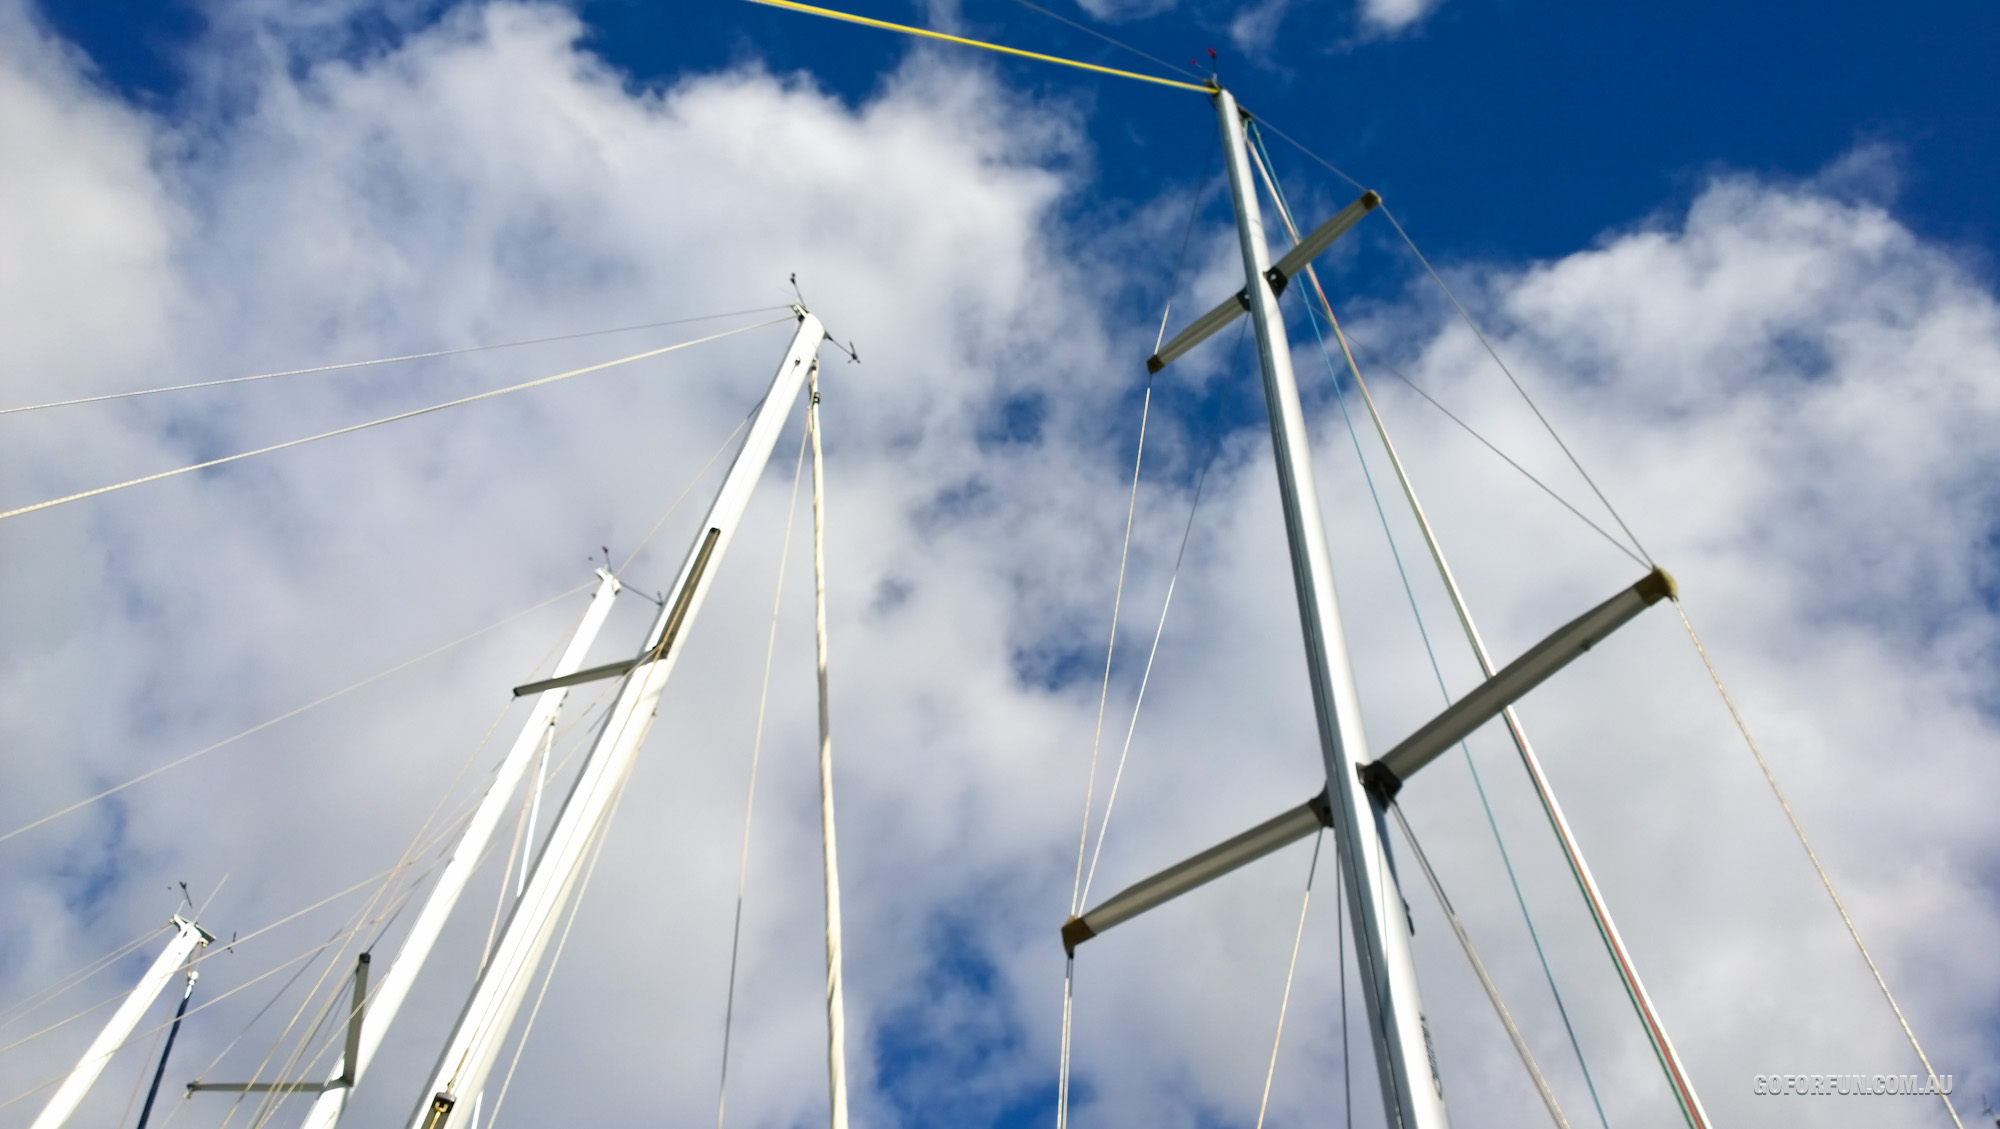 WP 16 10 58 Pro highres sailing sailboat climbing yacht